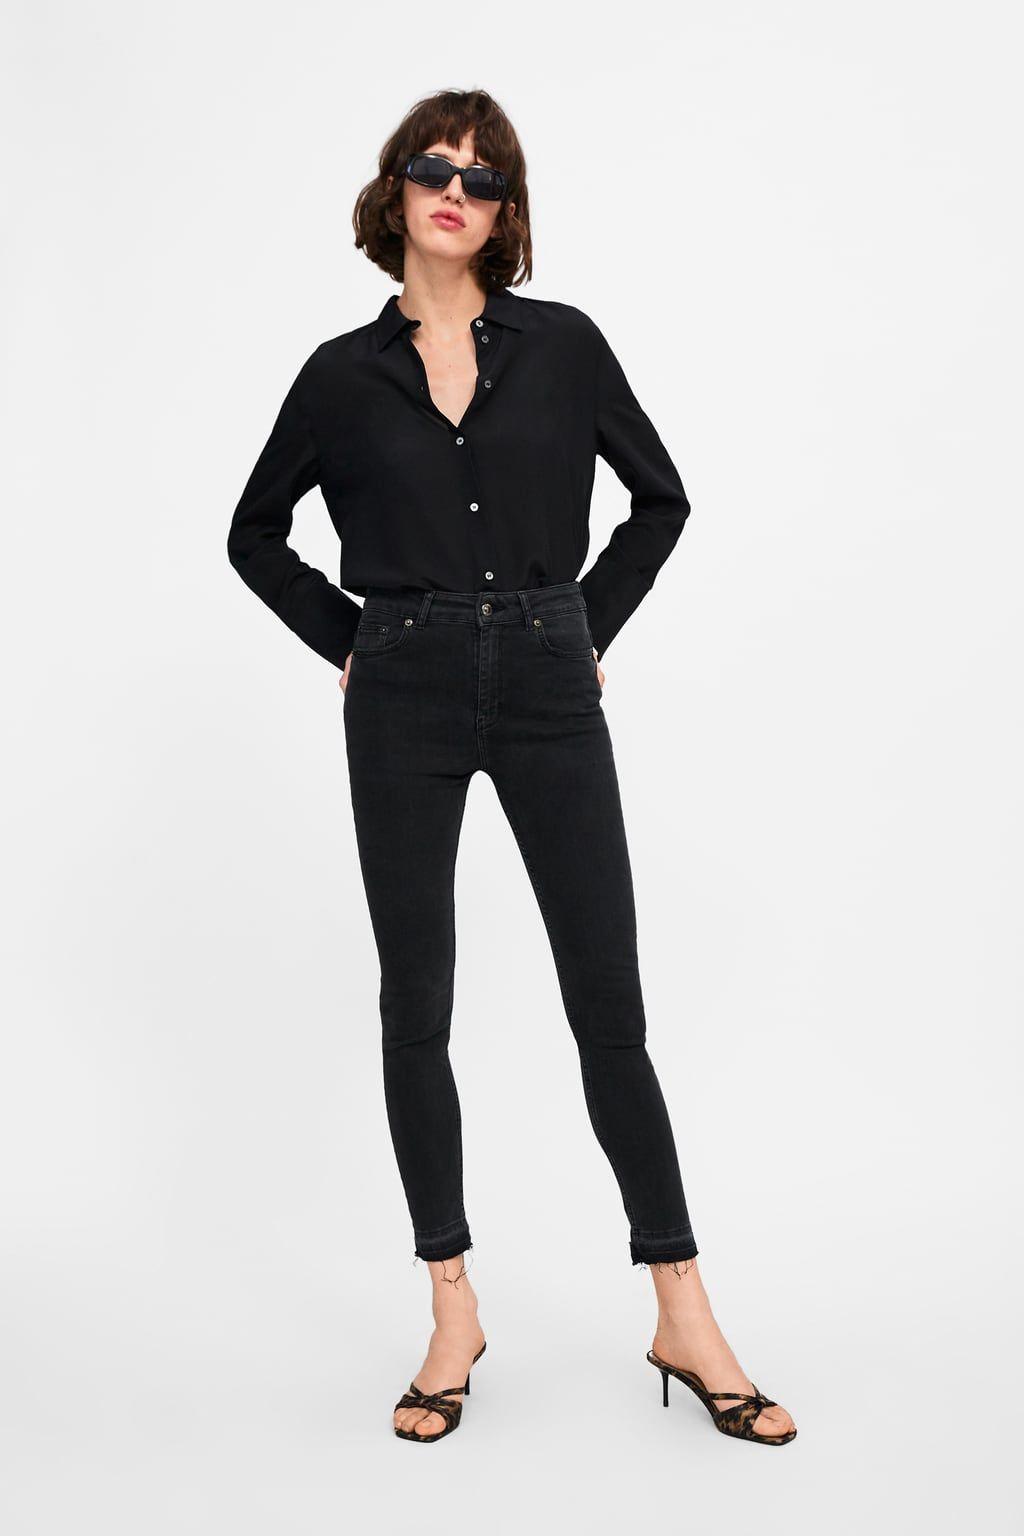 36aeac3e88 Zw premium high waist lead black jeans in 2019 | professionnelles ...